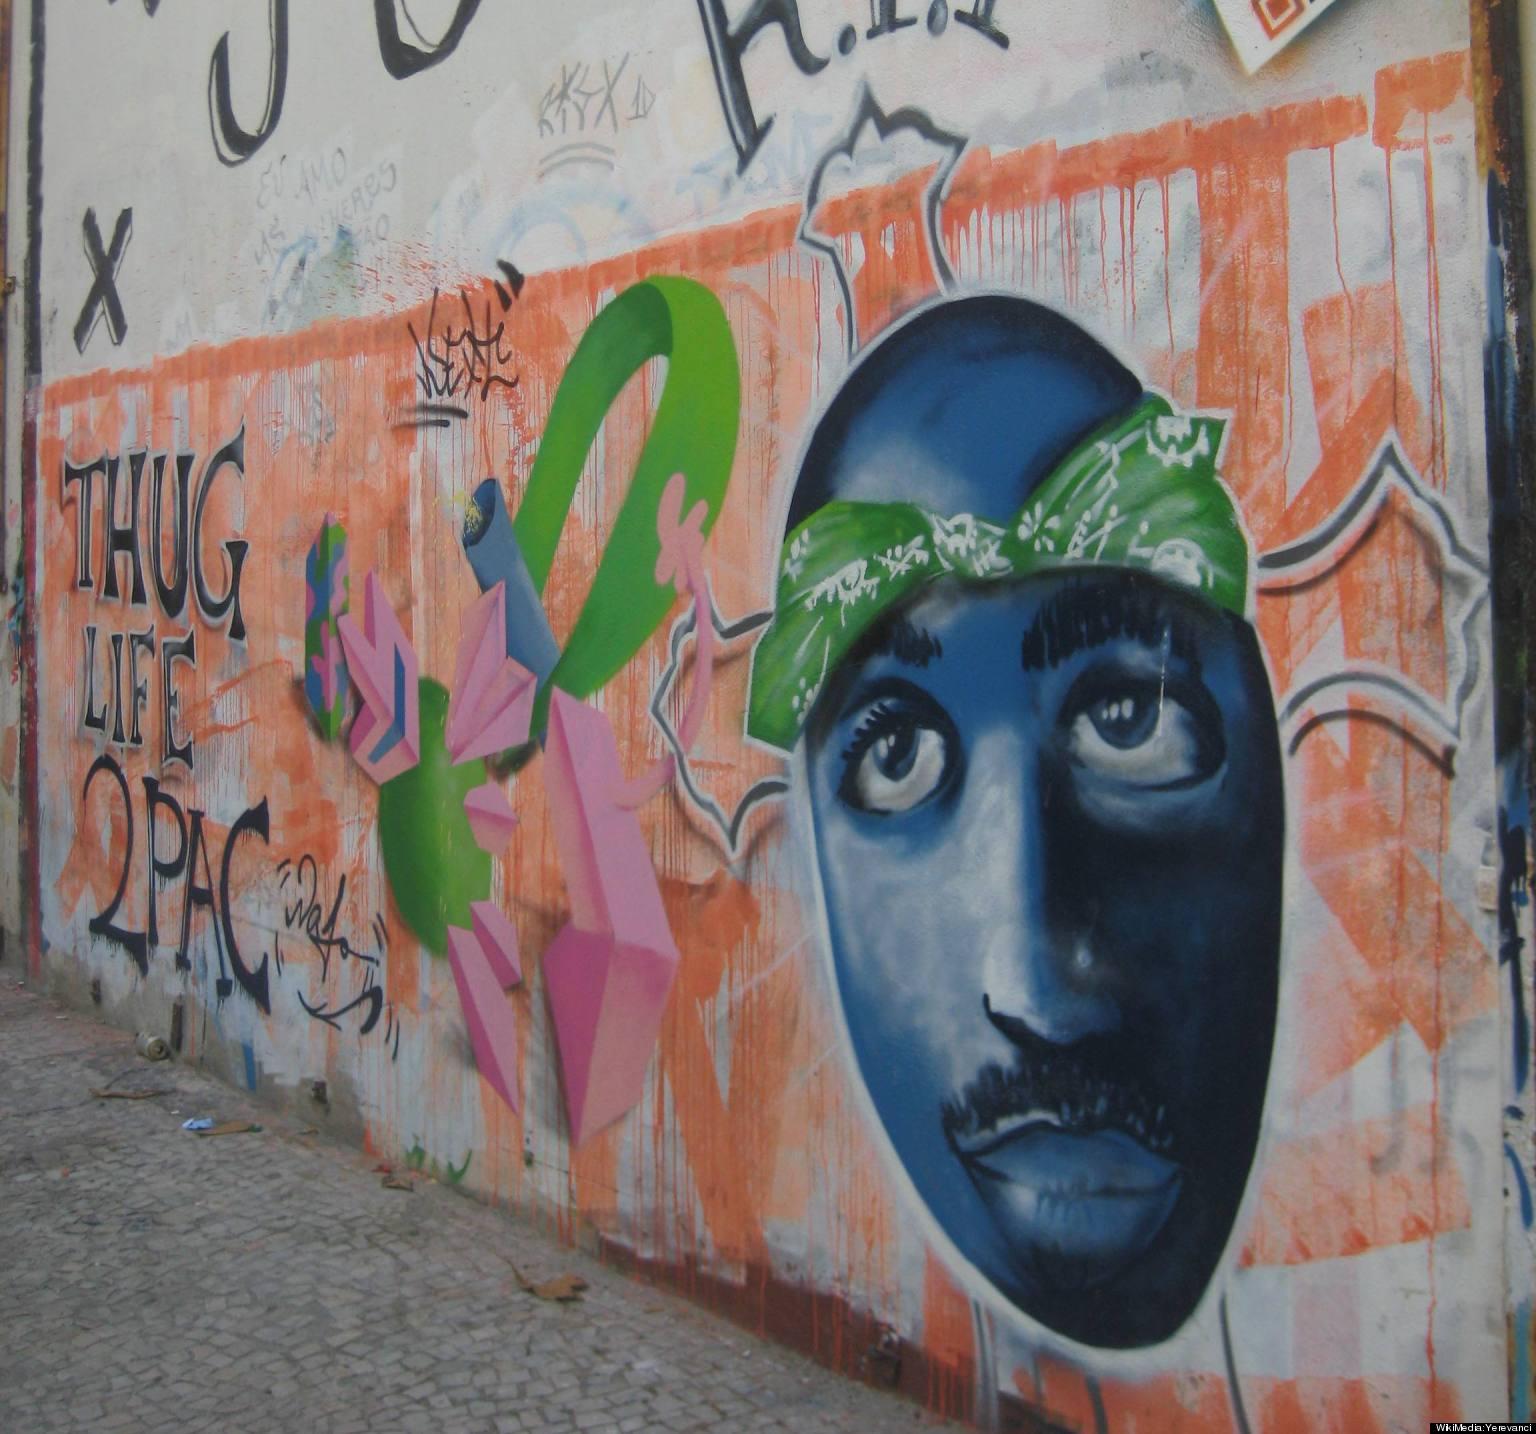 Tupac shakur jesus and resurrection power huffpost for 2pac mural new york